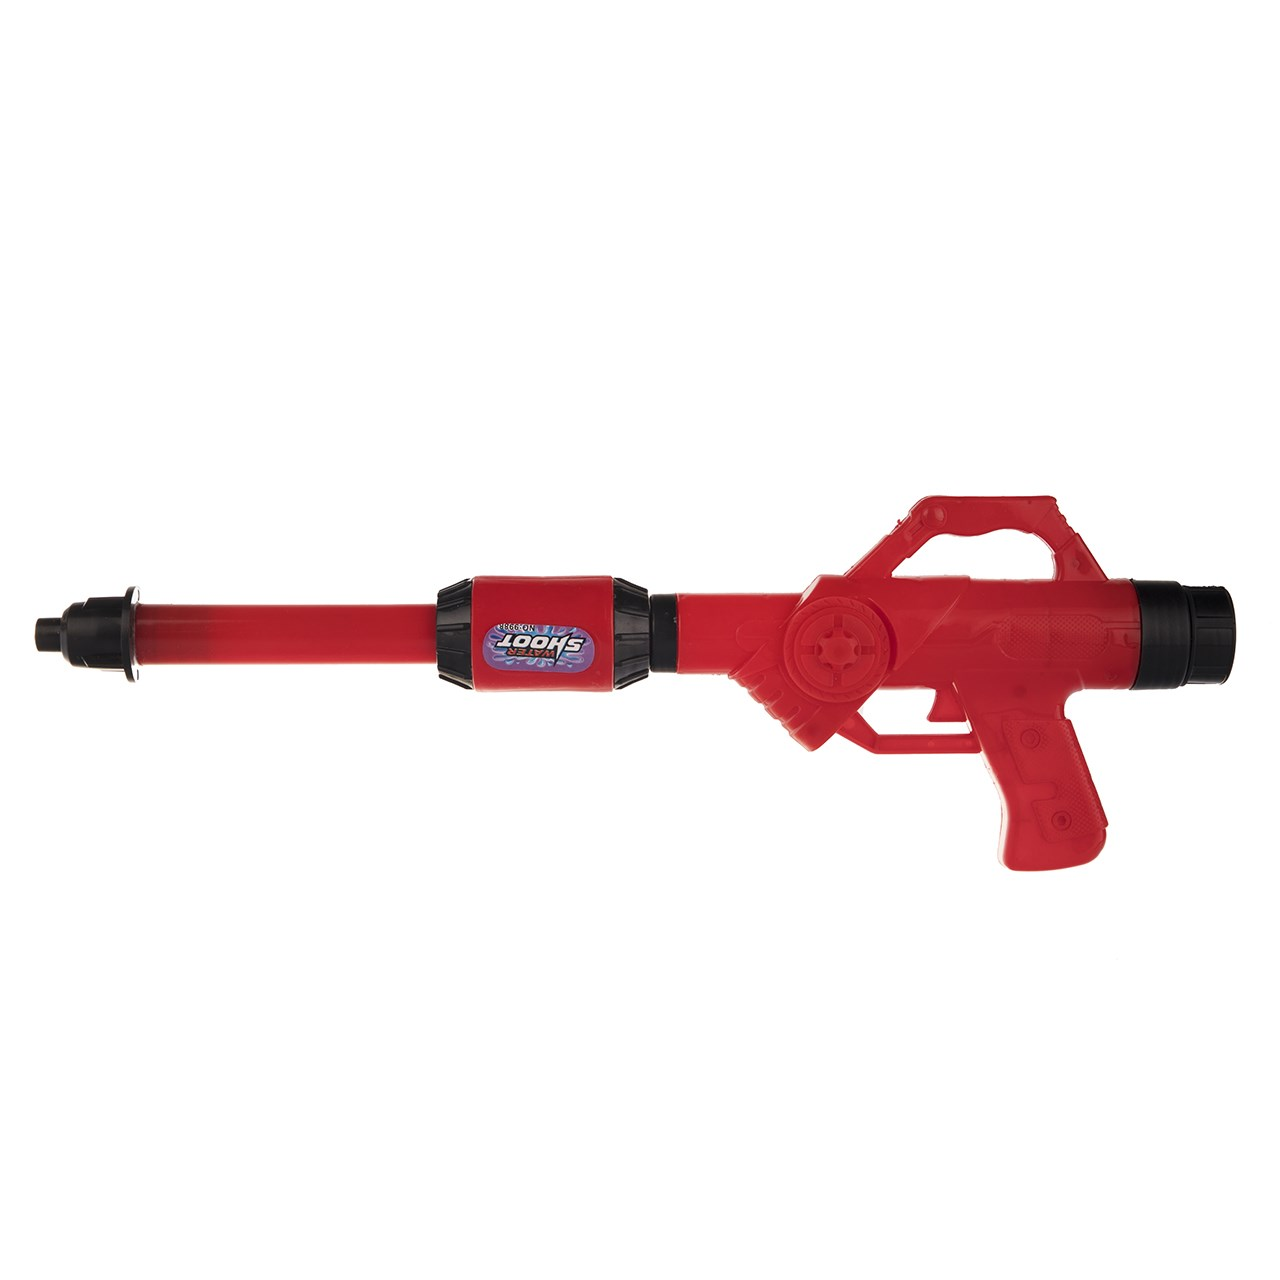 خرید                     تفنگ آبپاش مدل Water Shoot 9988